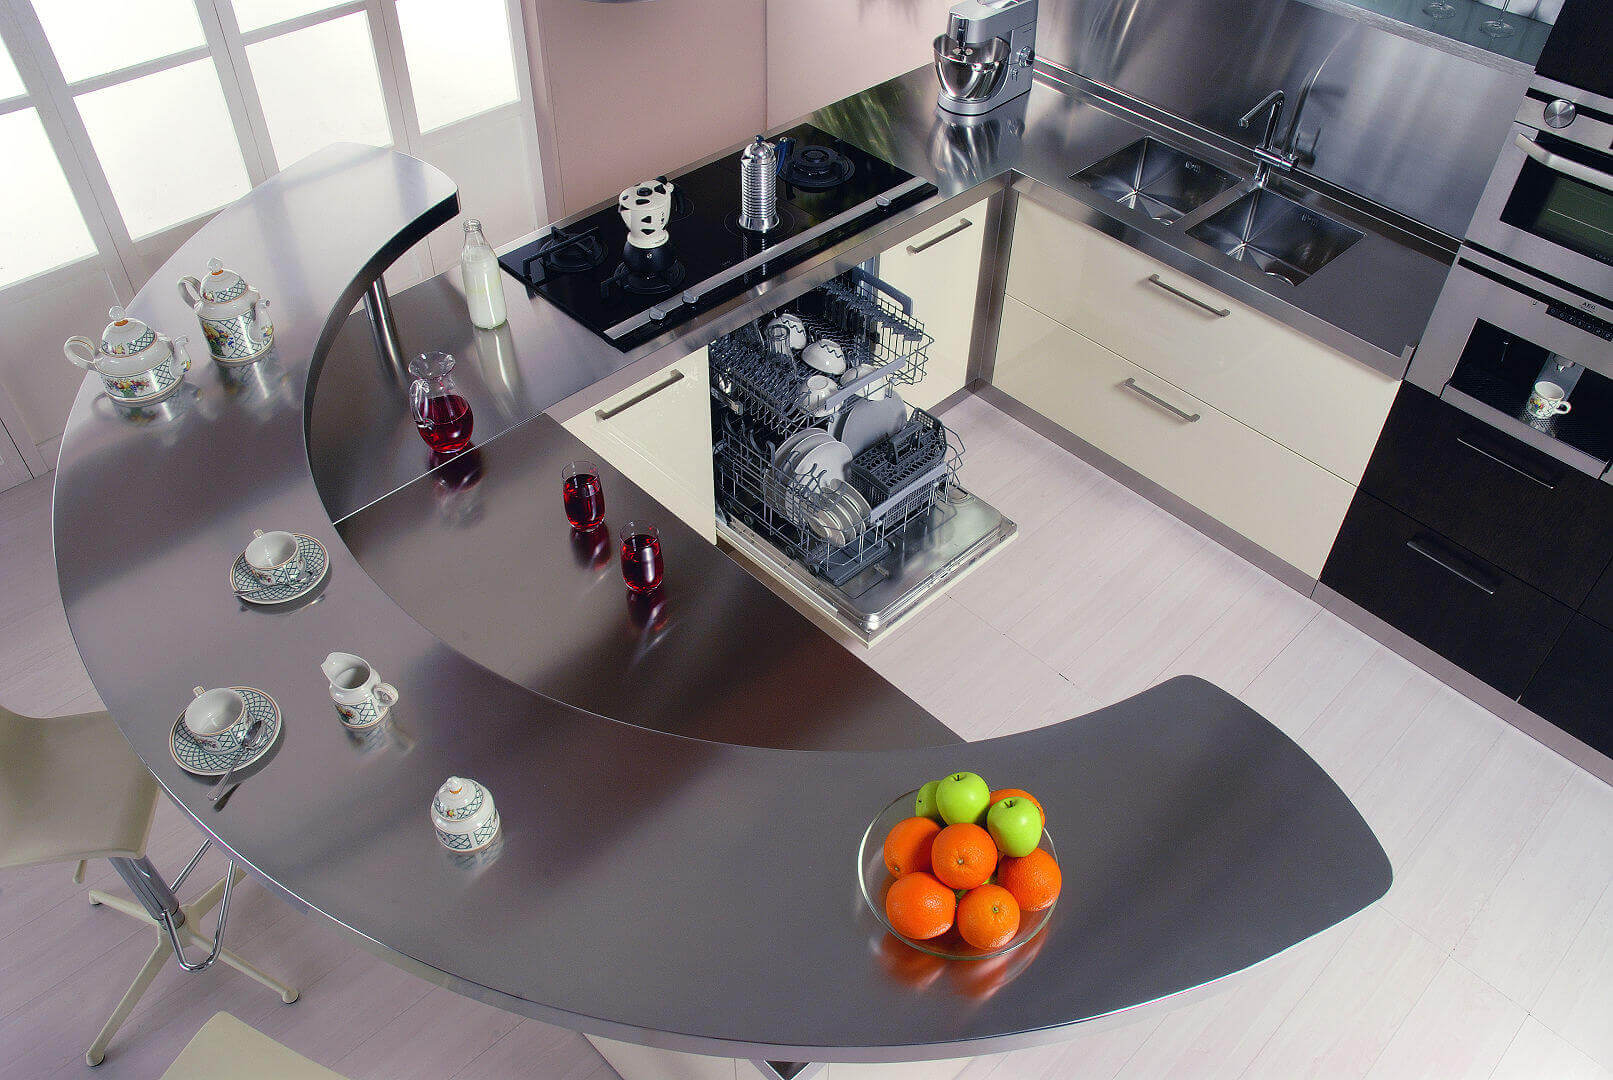 Arca Cucine Italy - Domestic stainless steel kitchens - 20 - Retunne - Dishwasher